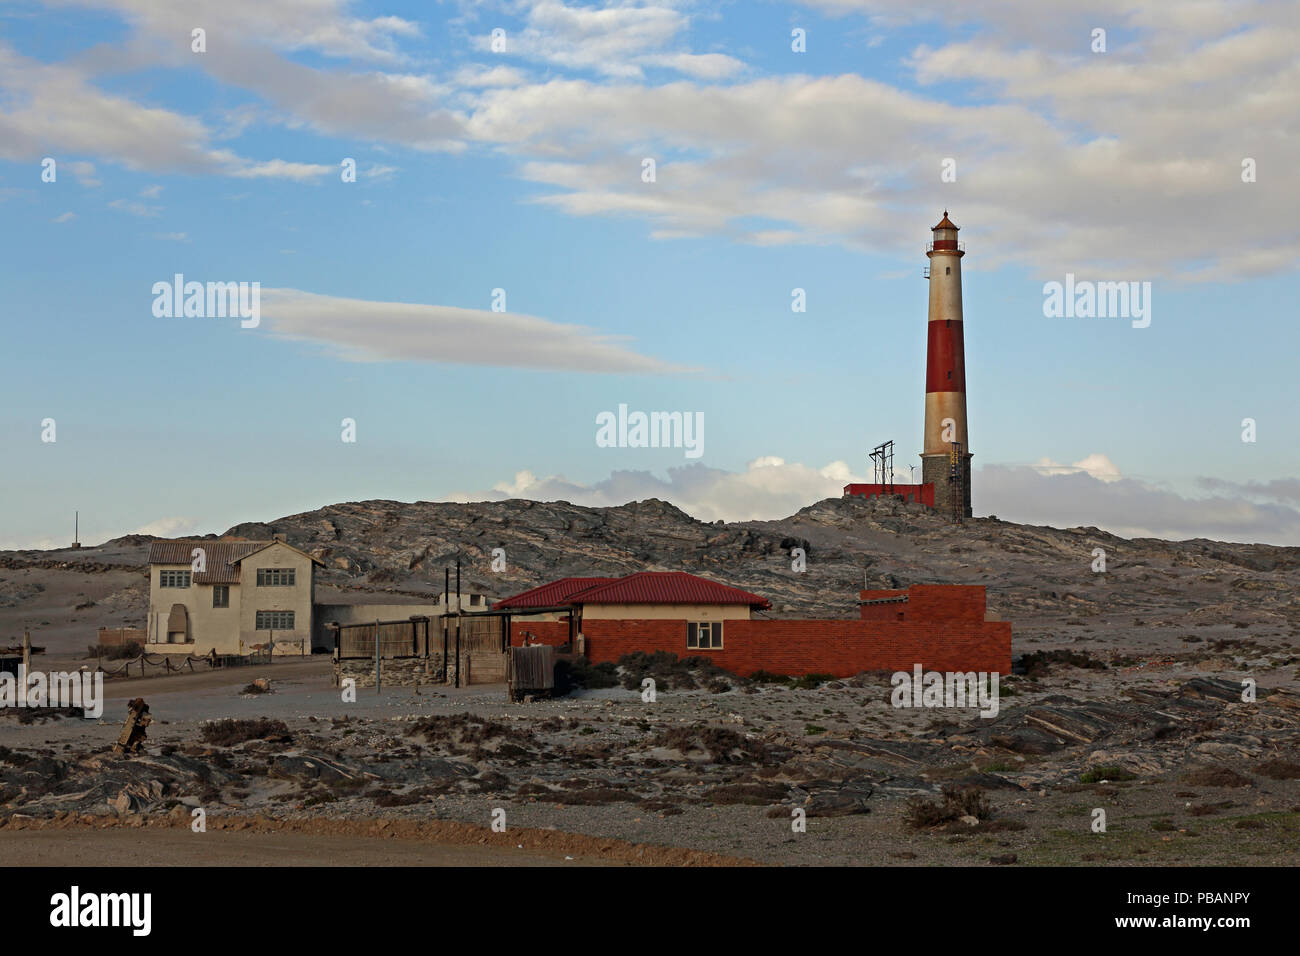 Diaz Point lighthouse, Lüderitz, southern Namibia. - Stock Image